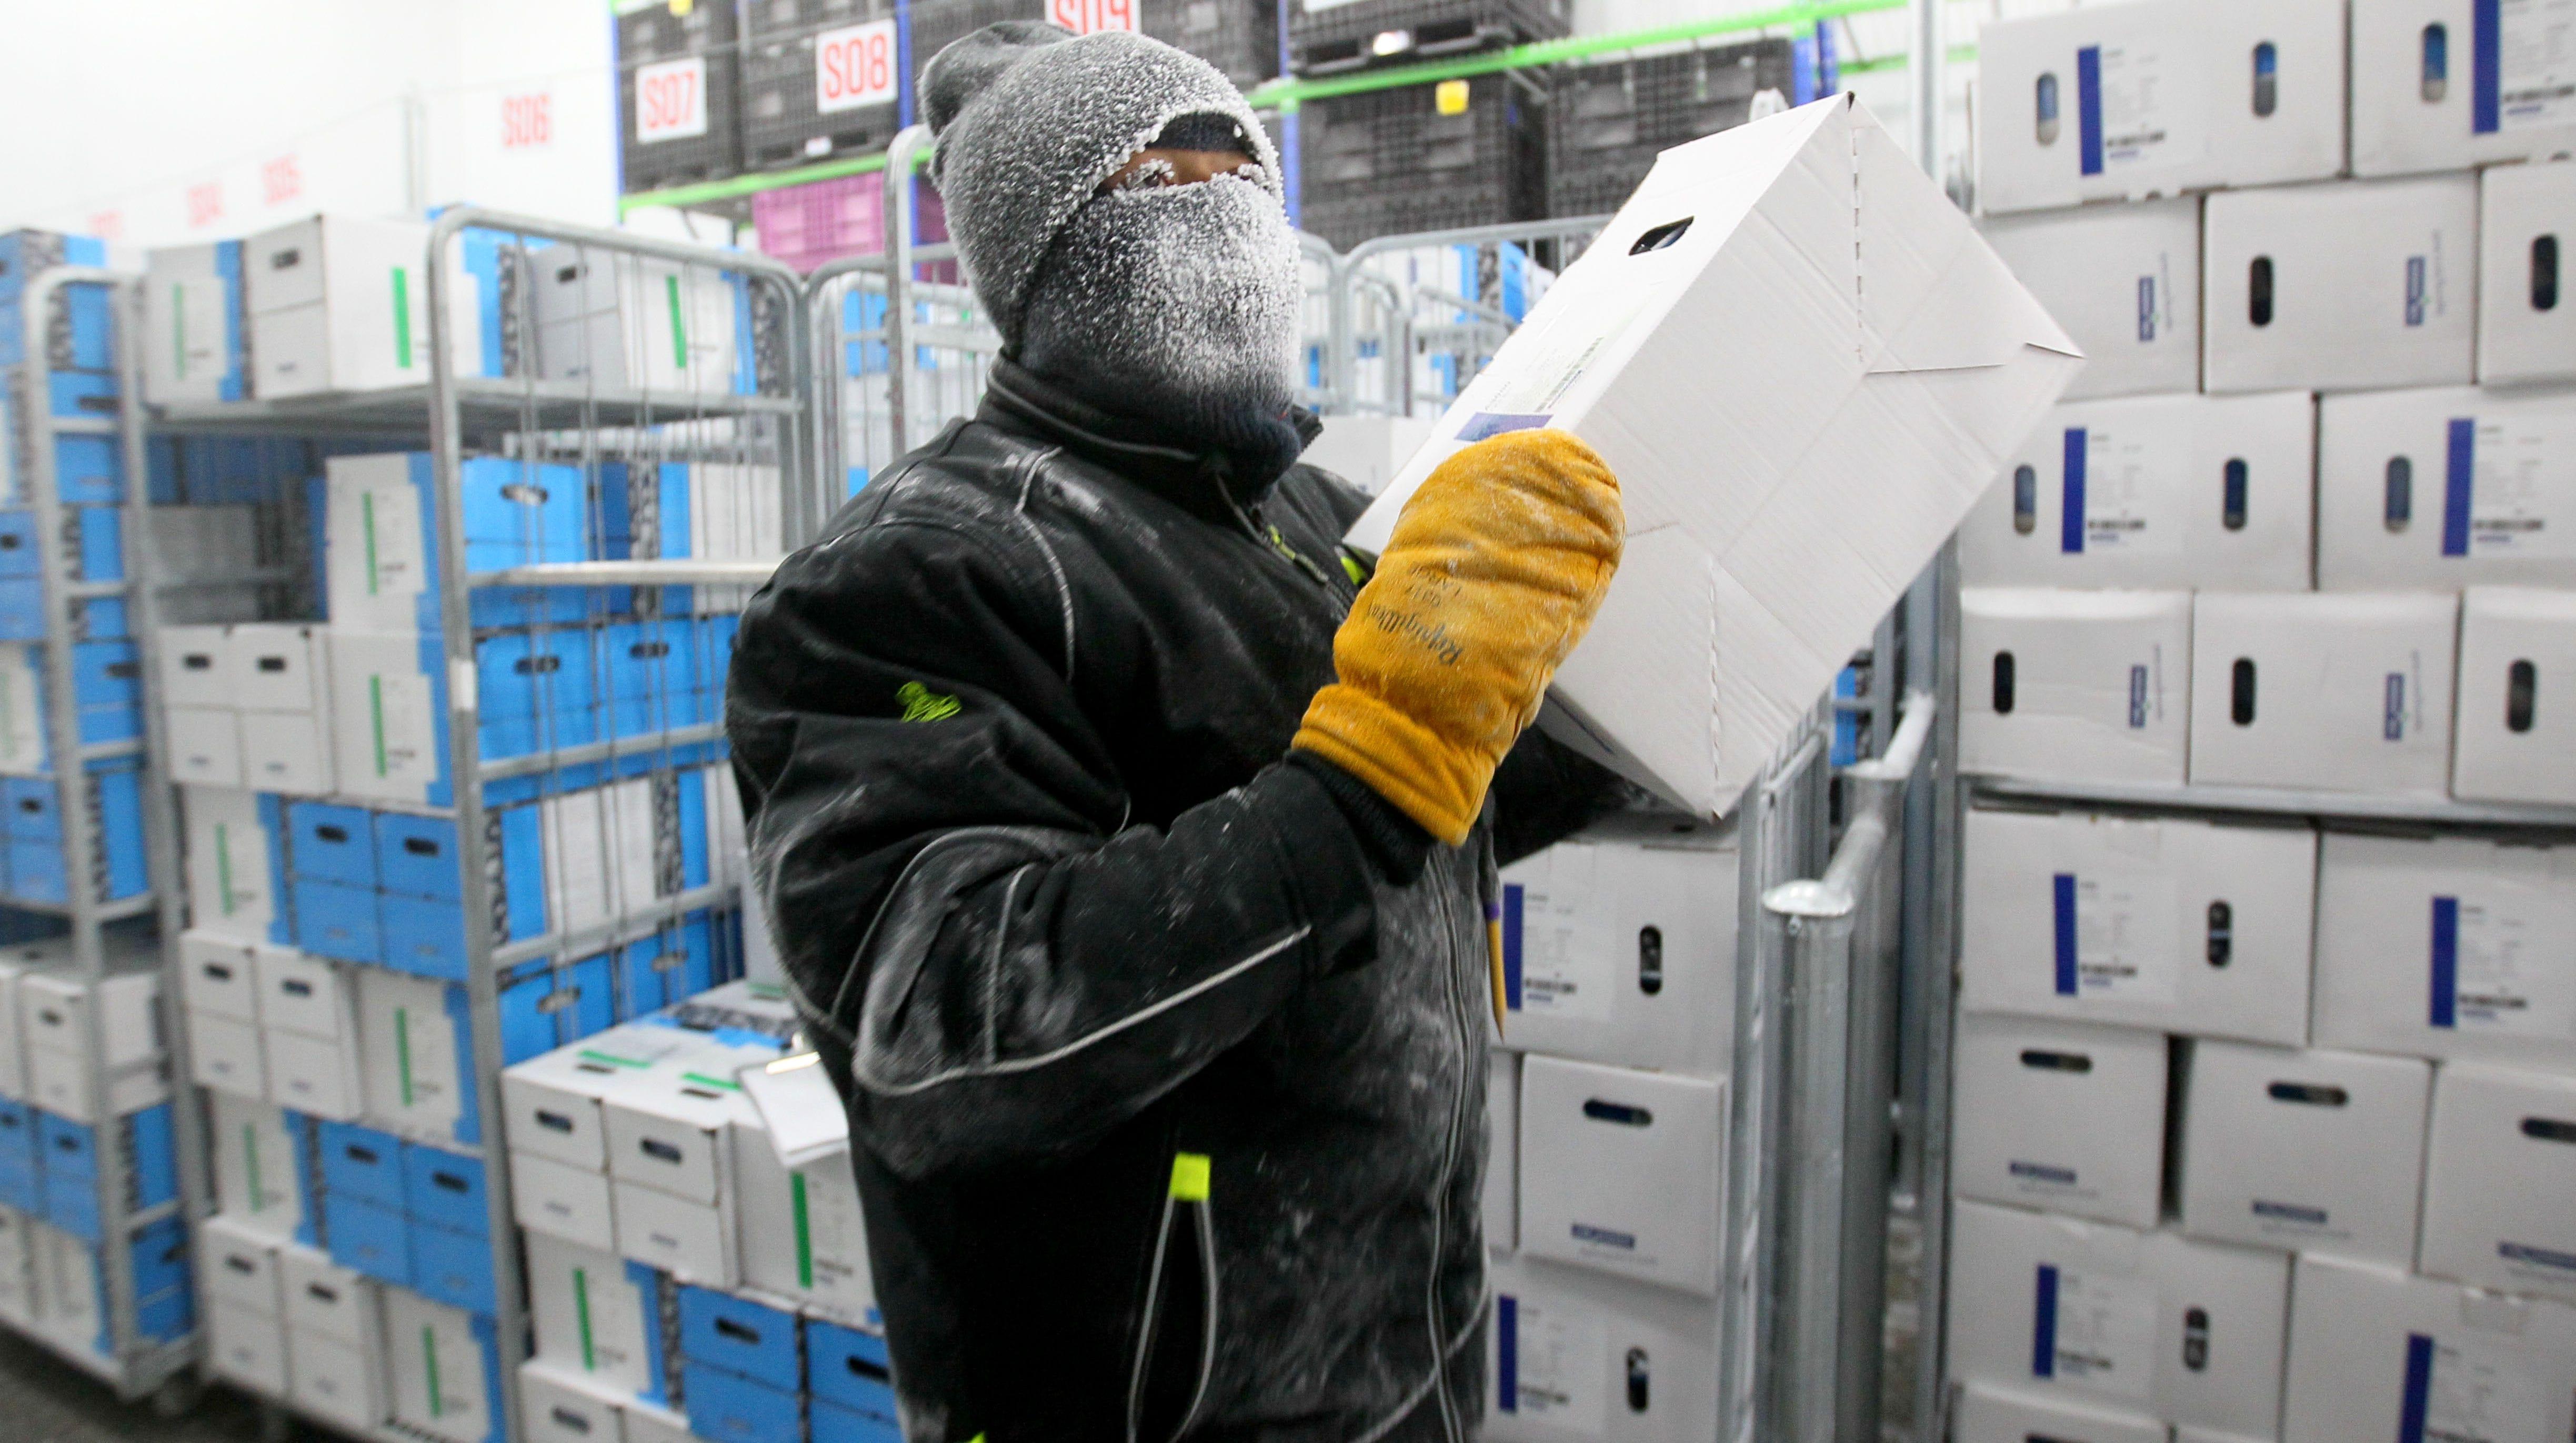 Kenny Jolliff, a freezer operator, picks orders...